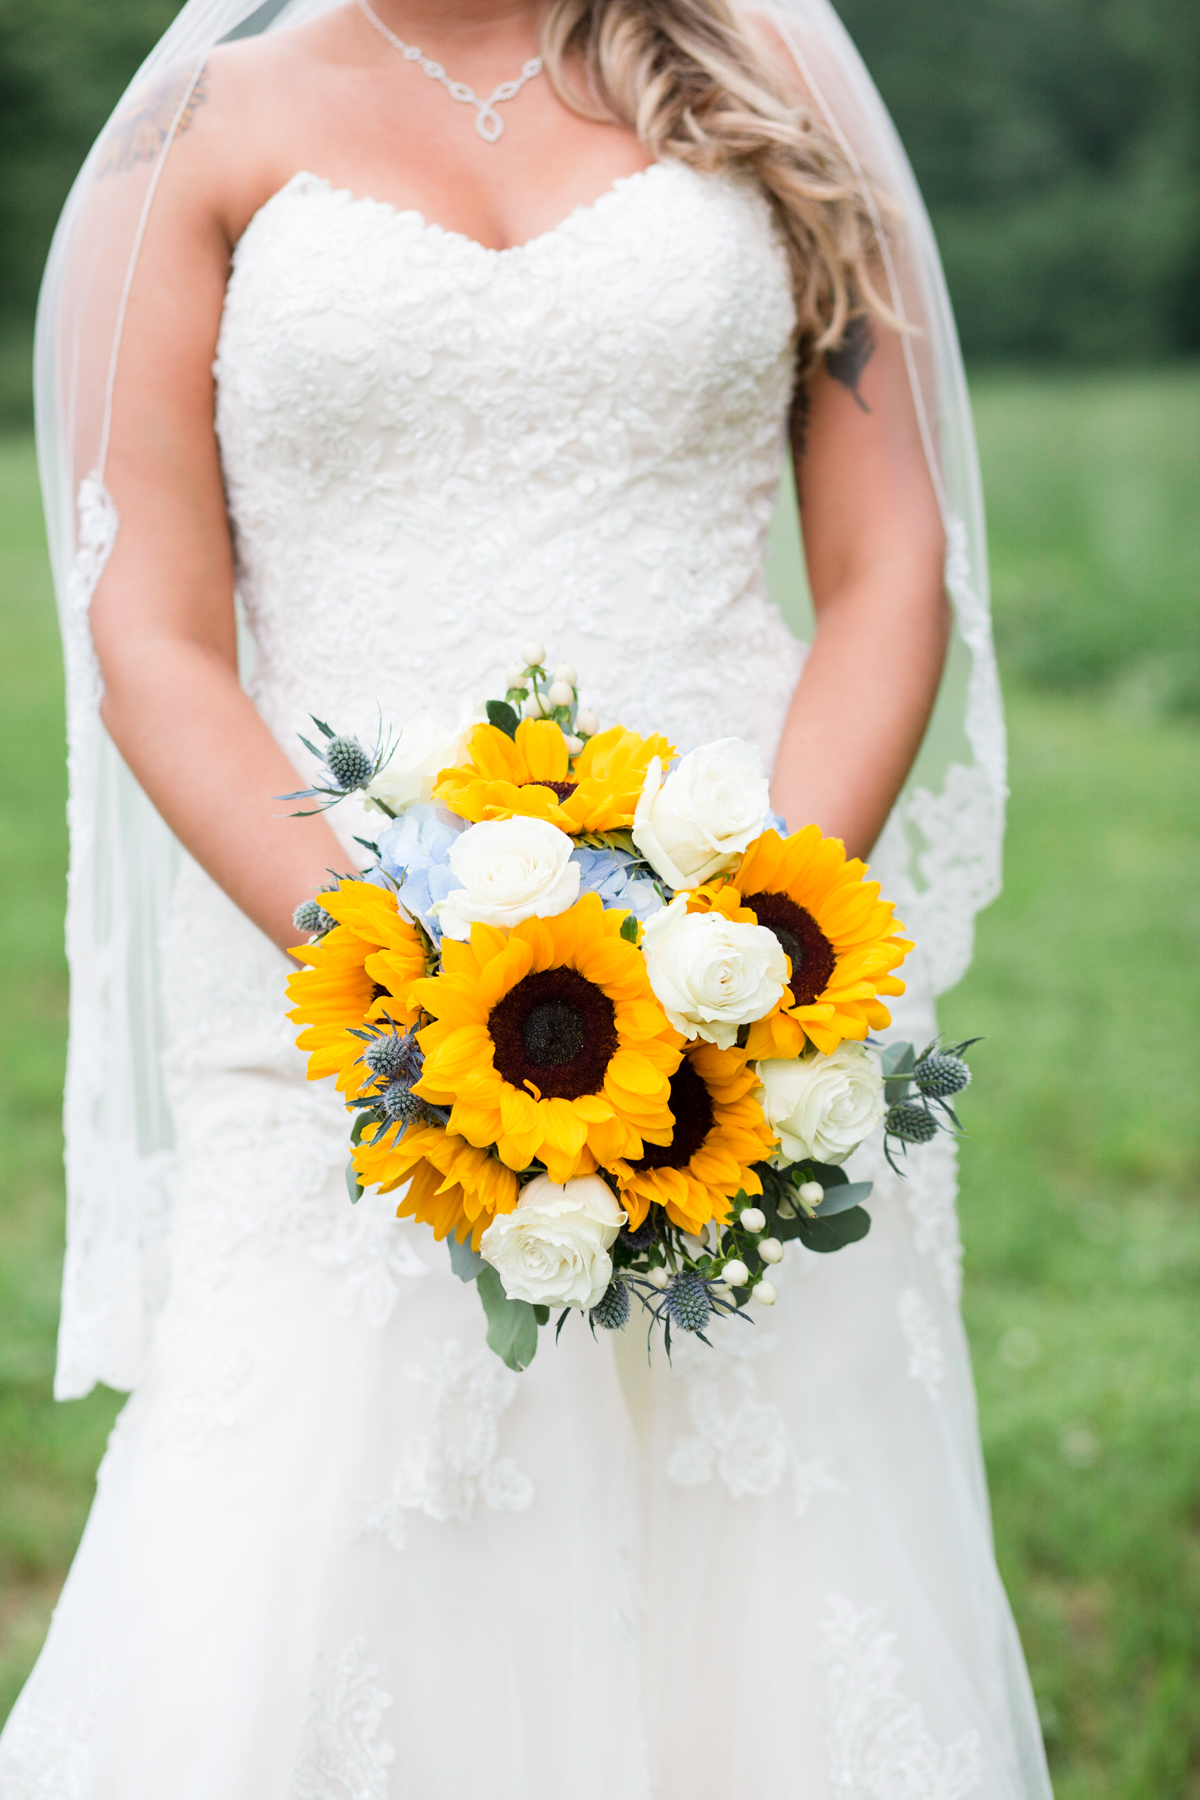 The-venue-at-white-oak-farms-wedding-nashville-wedding-photographers-0307.jpg